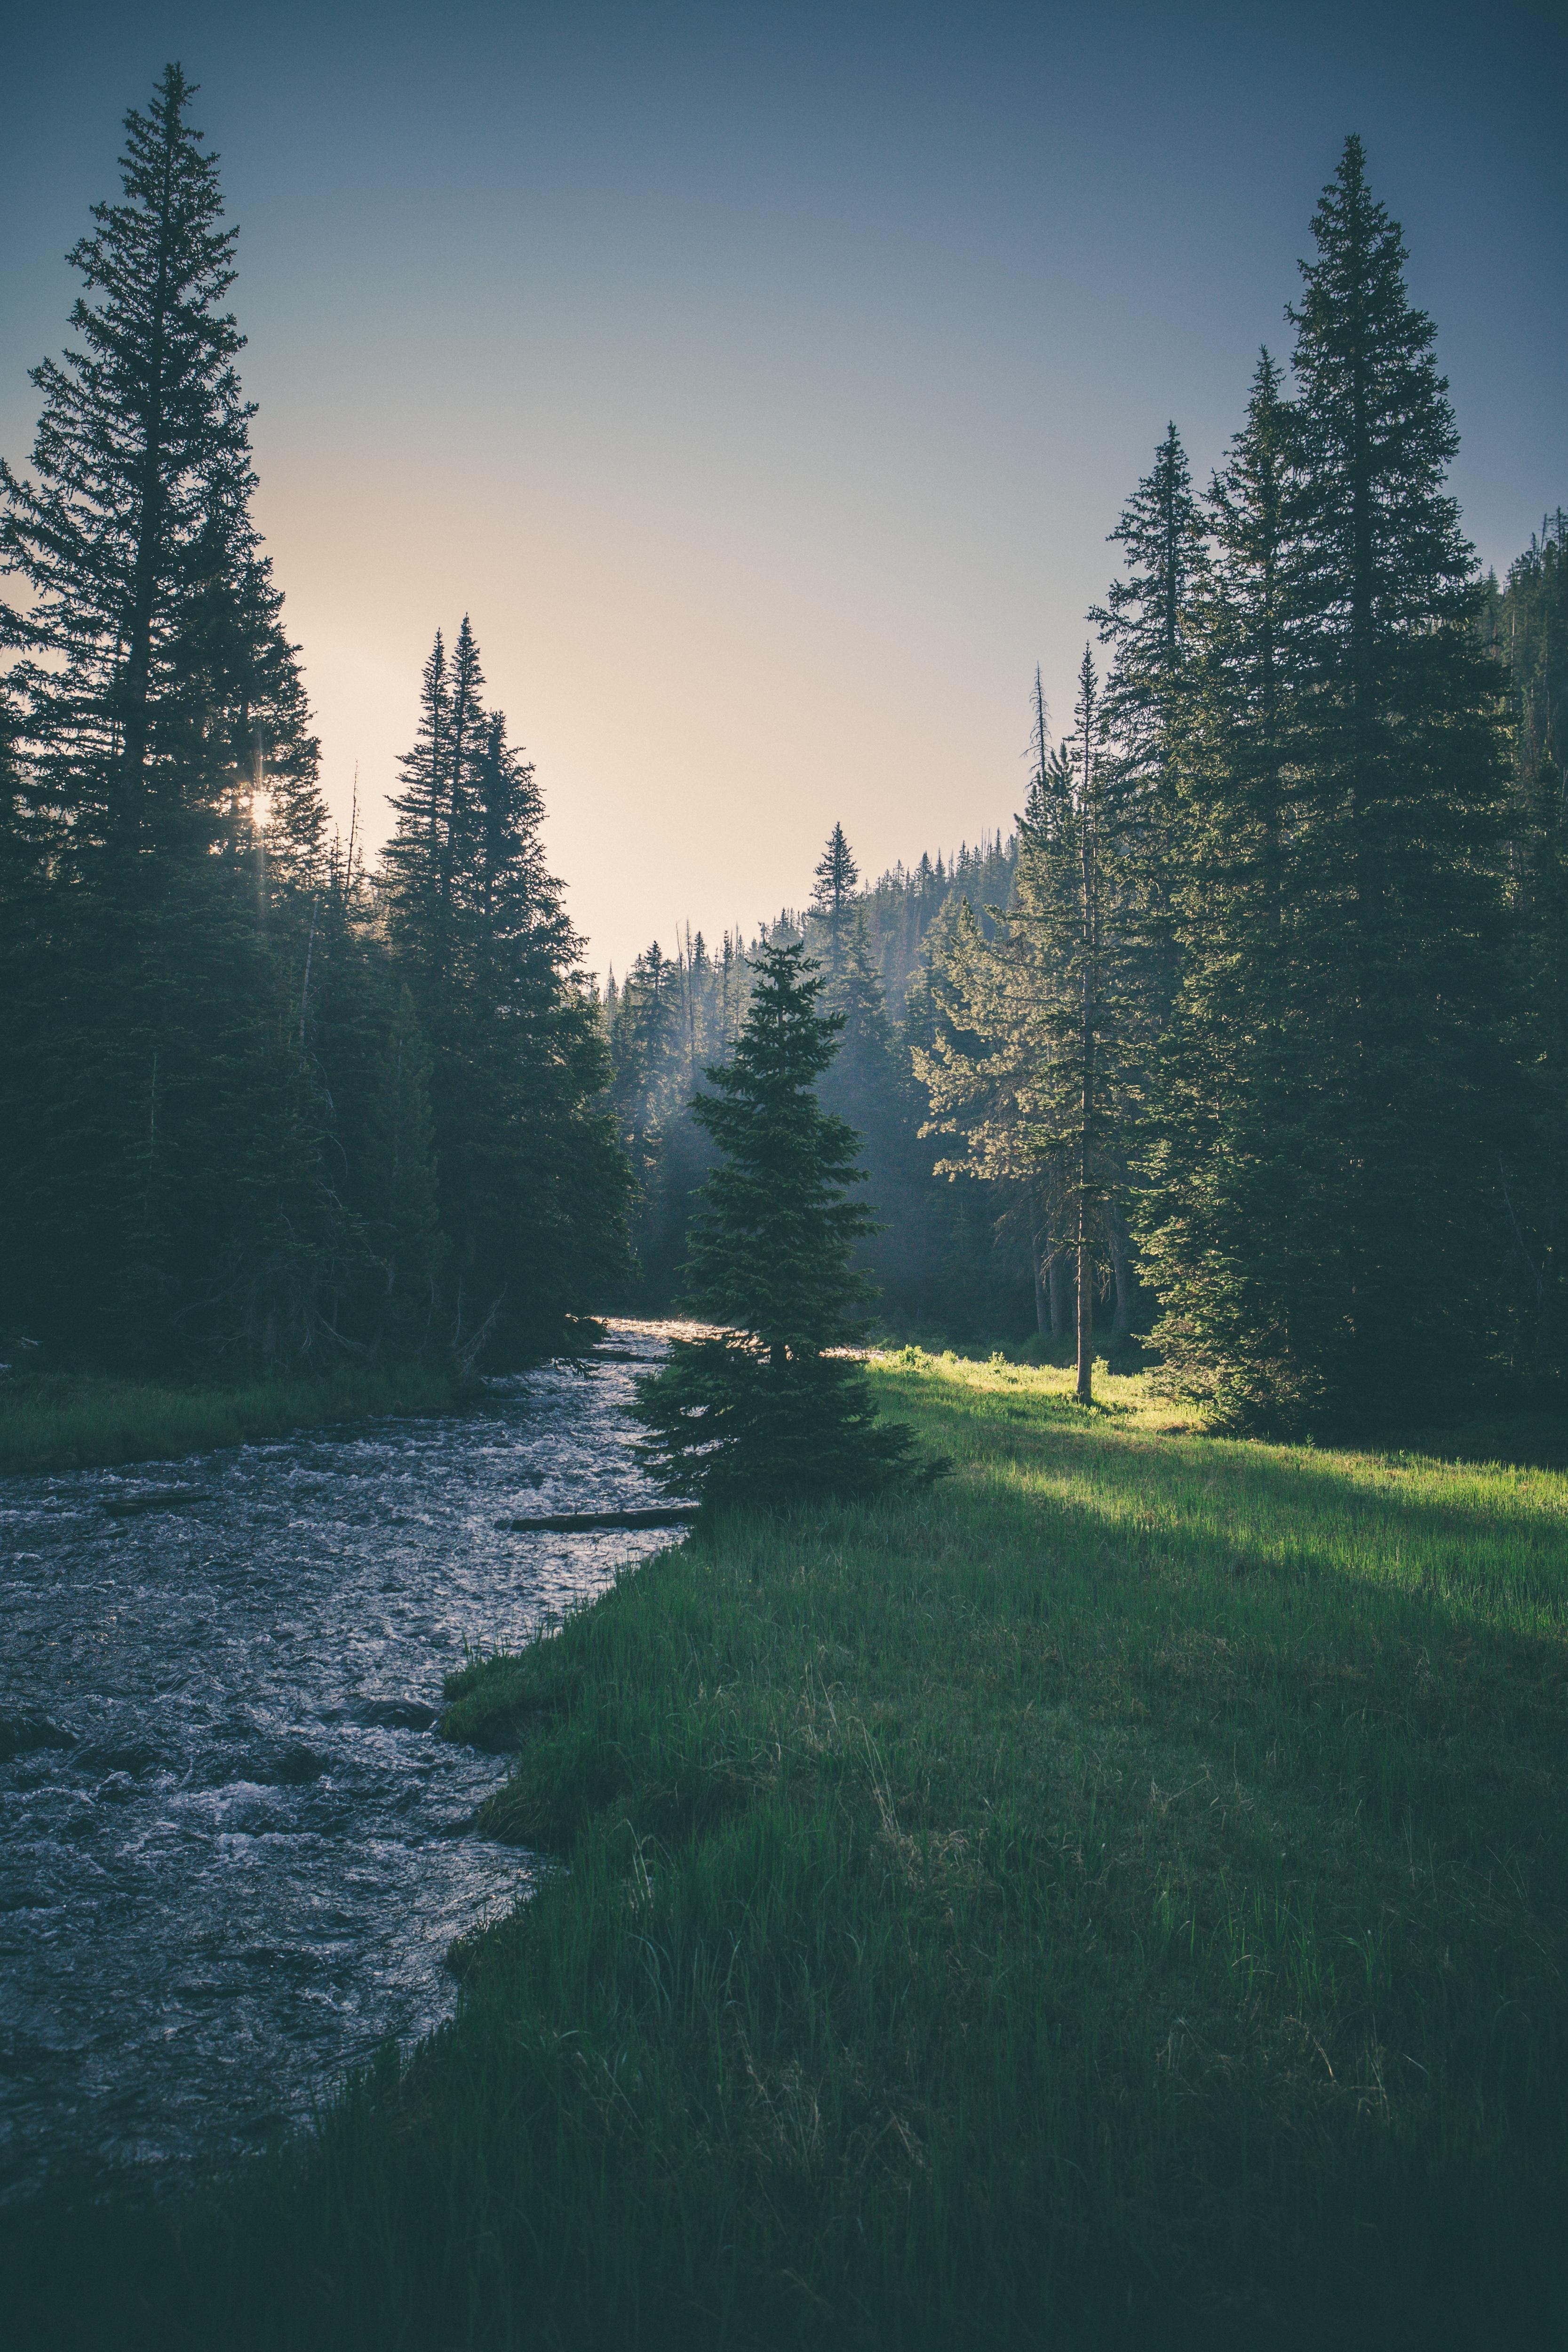 Nature, Tree, Water, Landscape, Jungle, HQ Photo